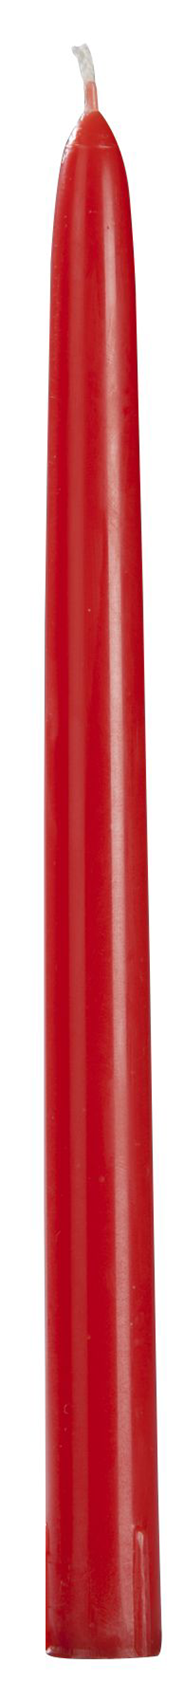 H-Line Spitzkerzen durchgefärbt Rot 30 Stück